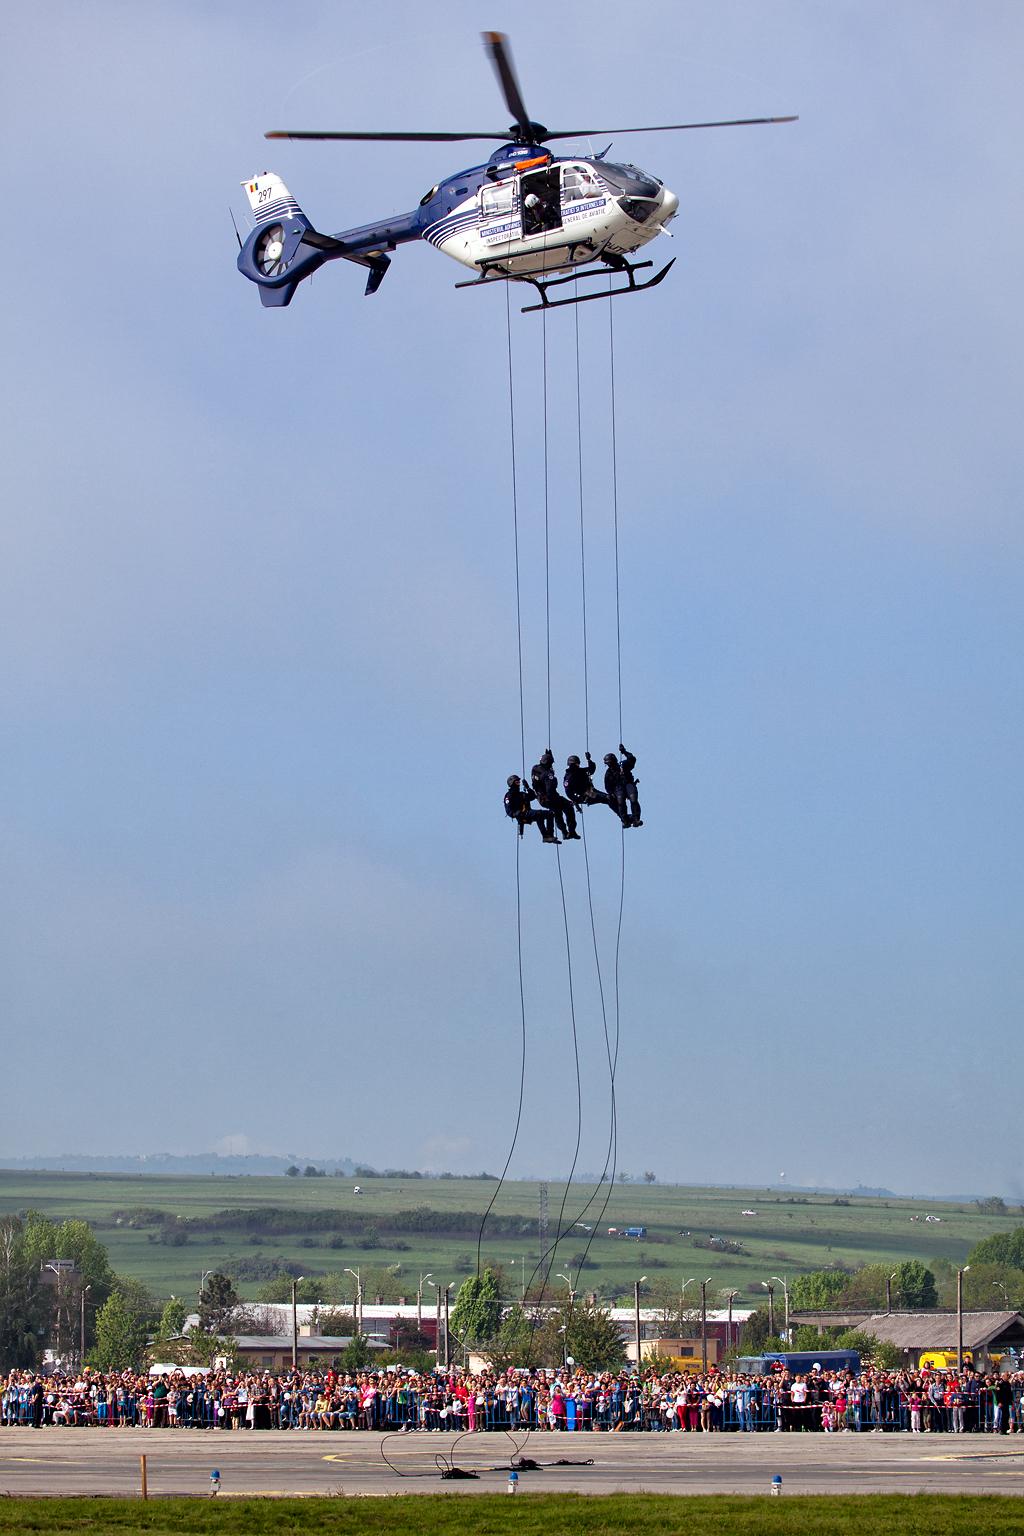 Cluj Napoca Airshow - 5 mai 2012 - Poze - Pagina 2 07